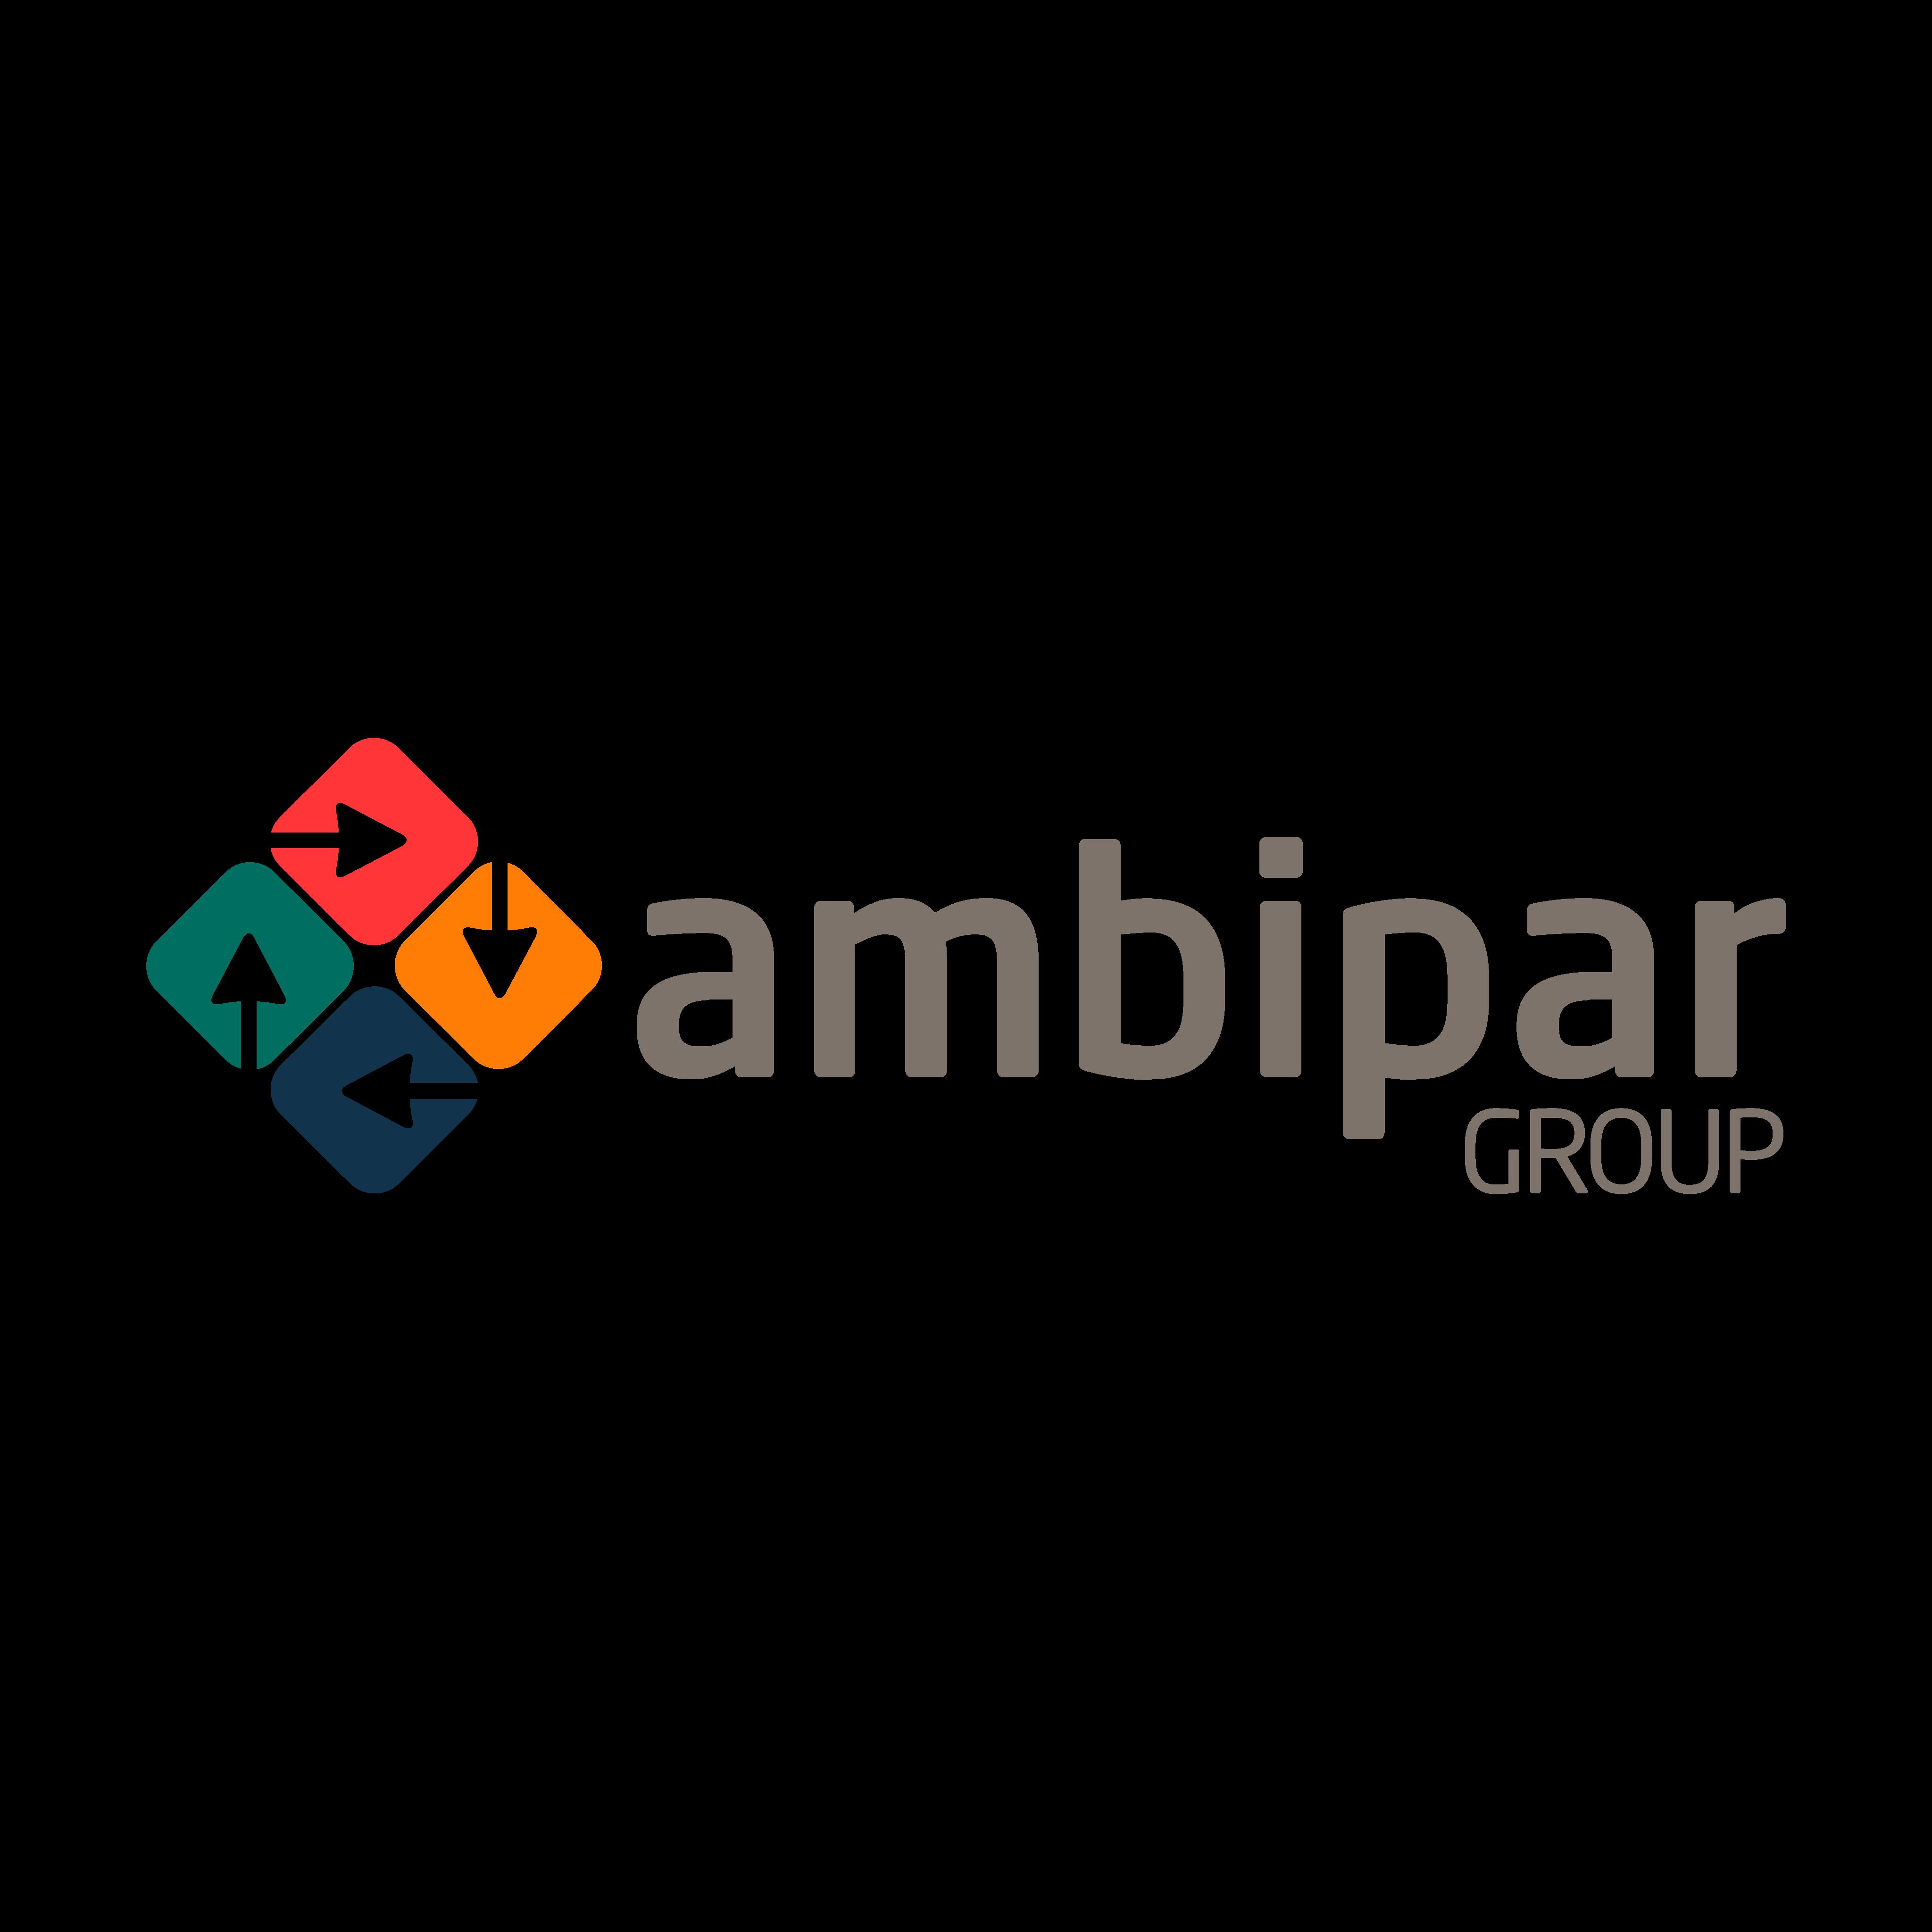 ambipar logo 0 - Ambipar Group Logo